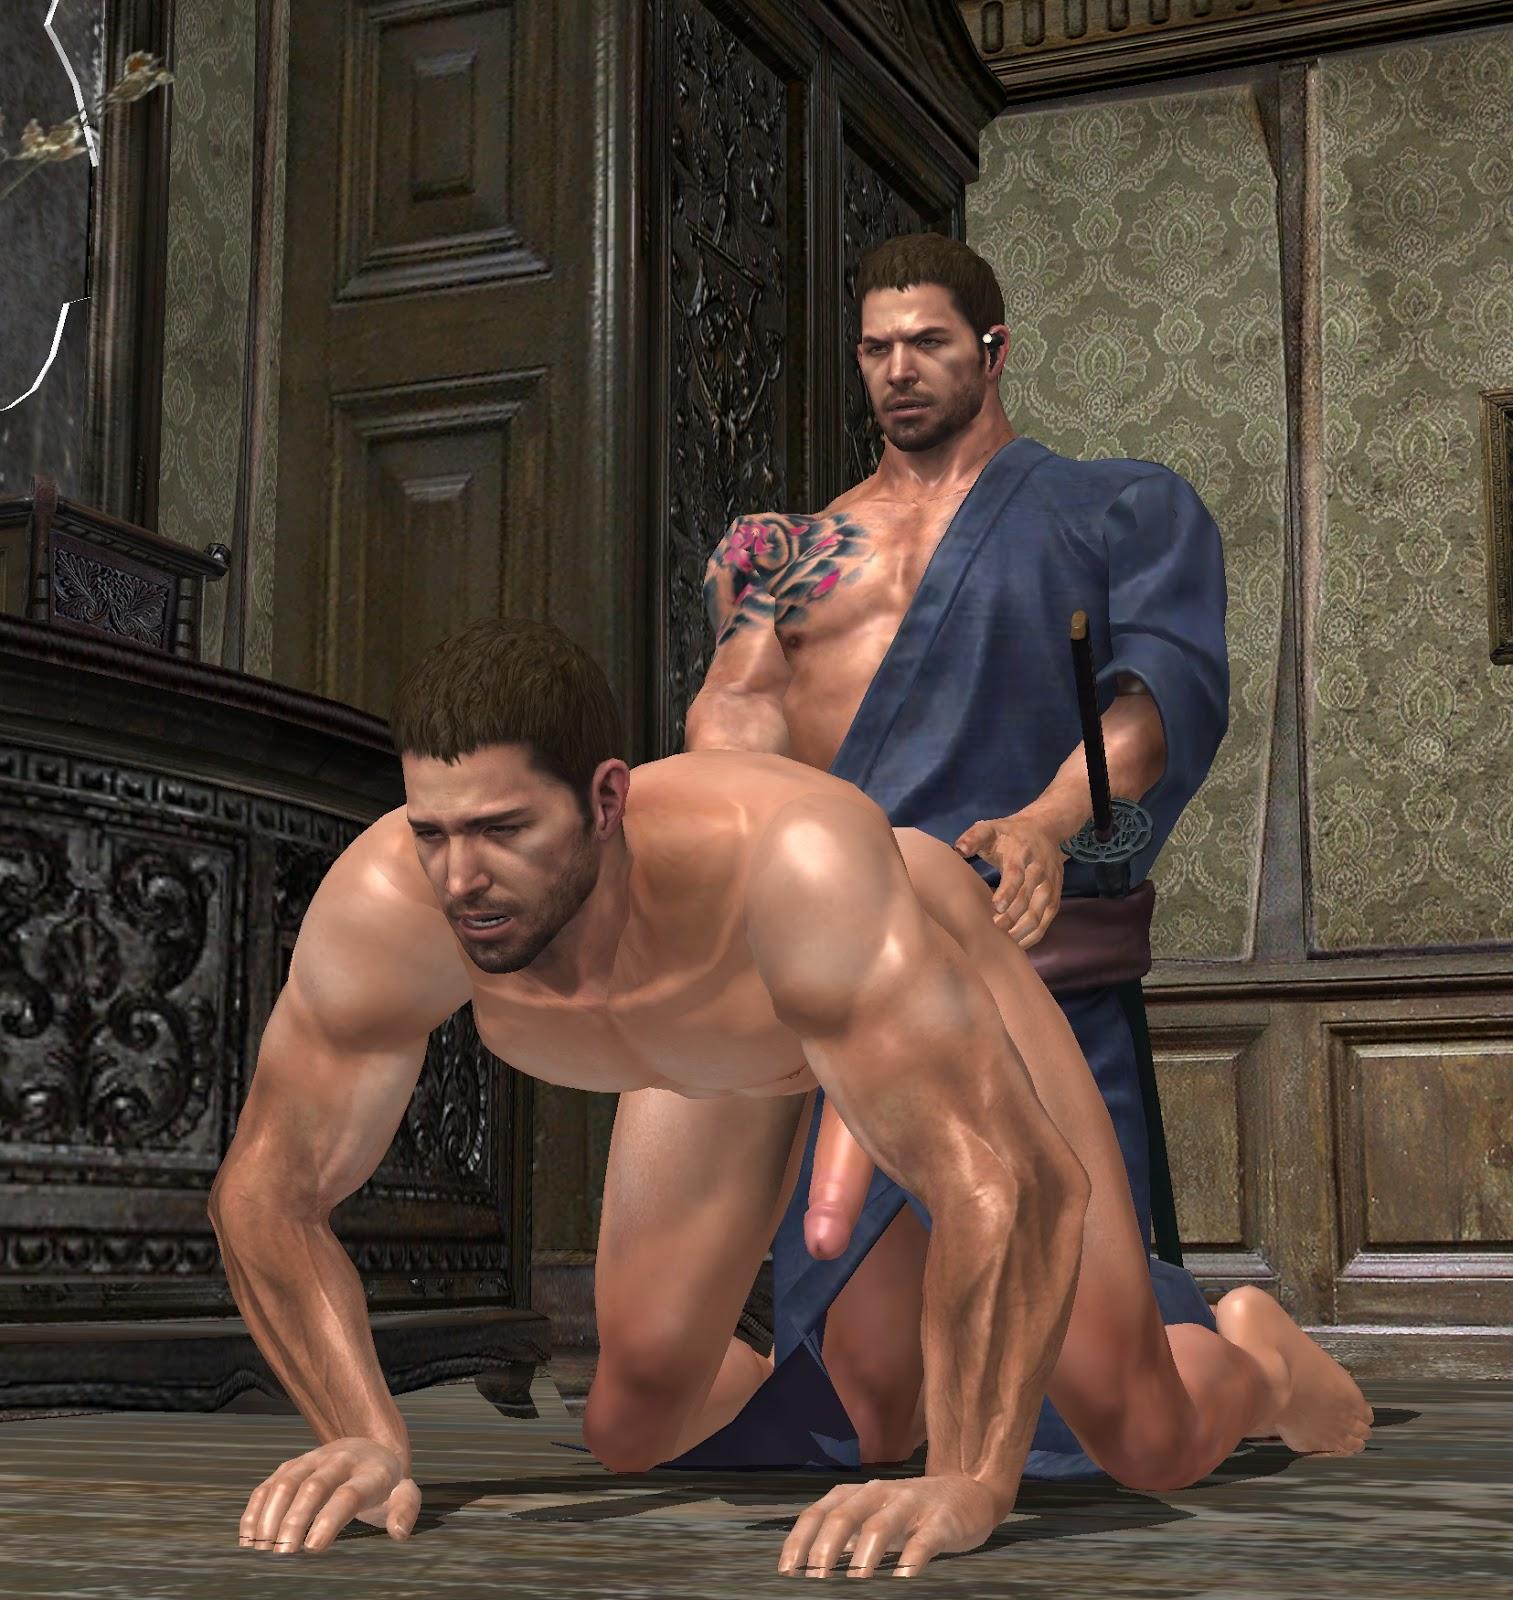 Gay sex game online